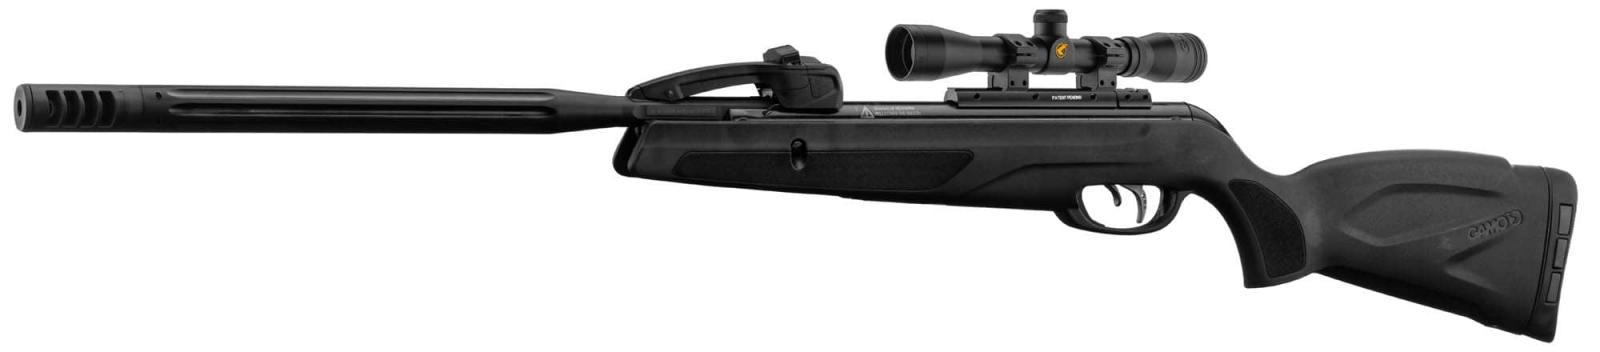 Carabine GAMO REPLAY 10 + Lunette 4x32